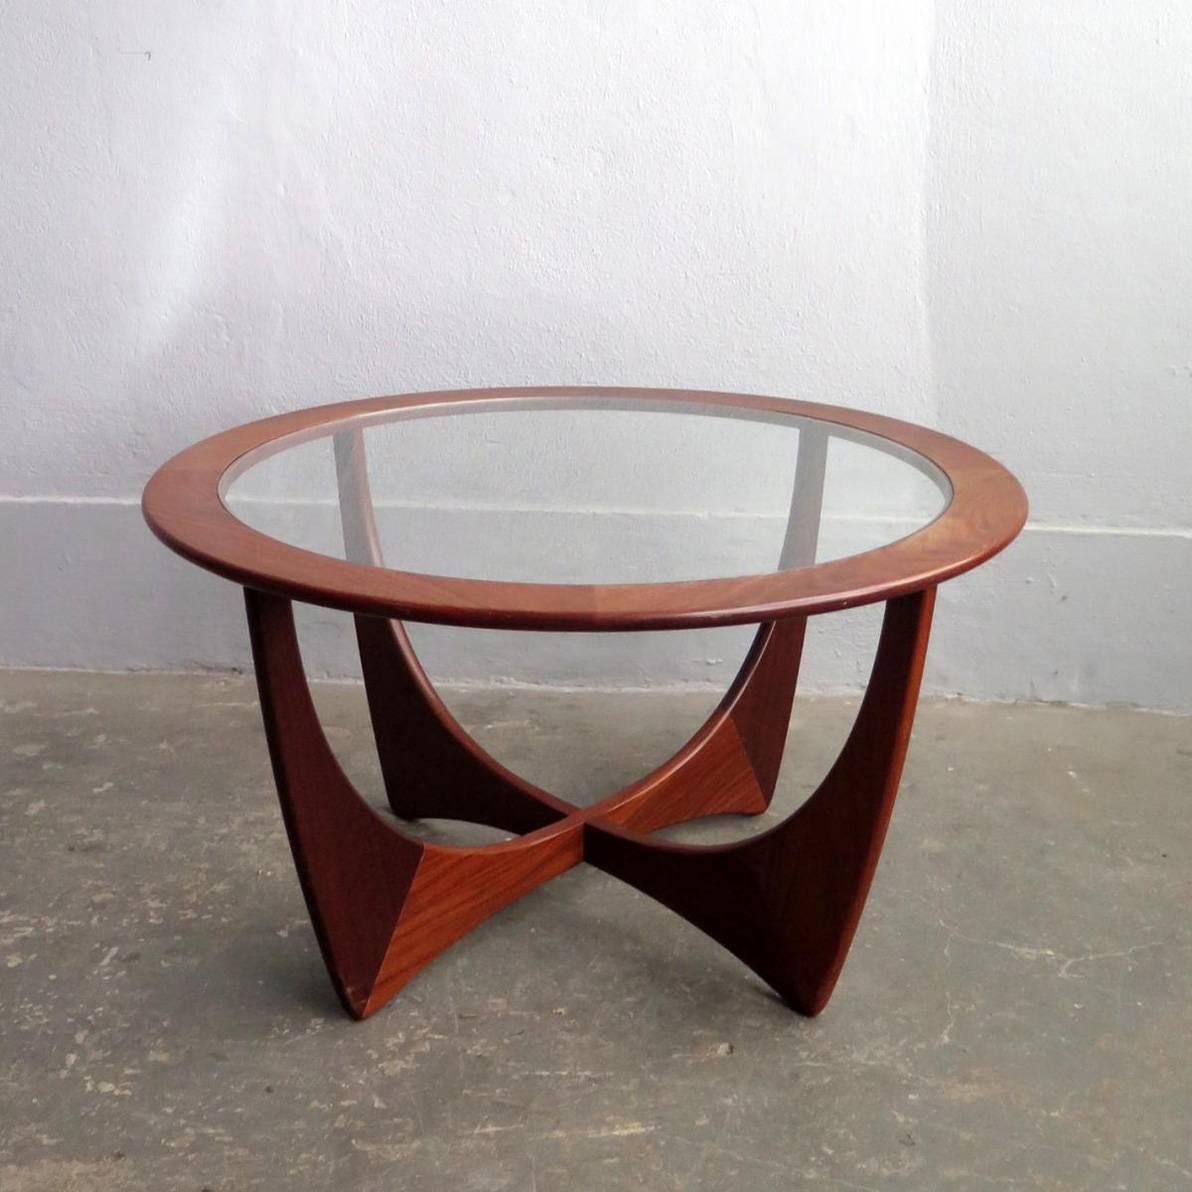 Teak Glass Top Coffee Table | Courtagerivegauche Regarding Retro Teak Glass Coffee Tables (View 5 of 30)